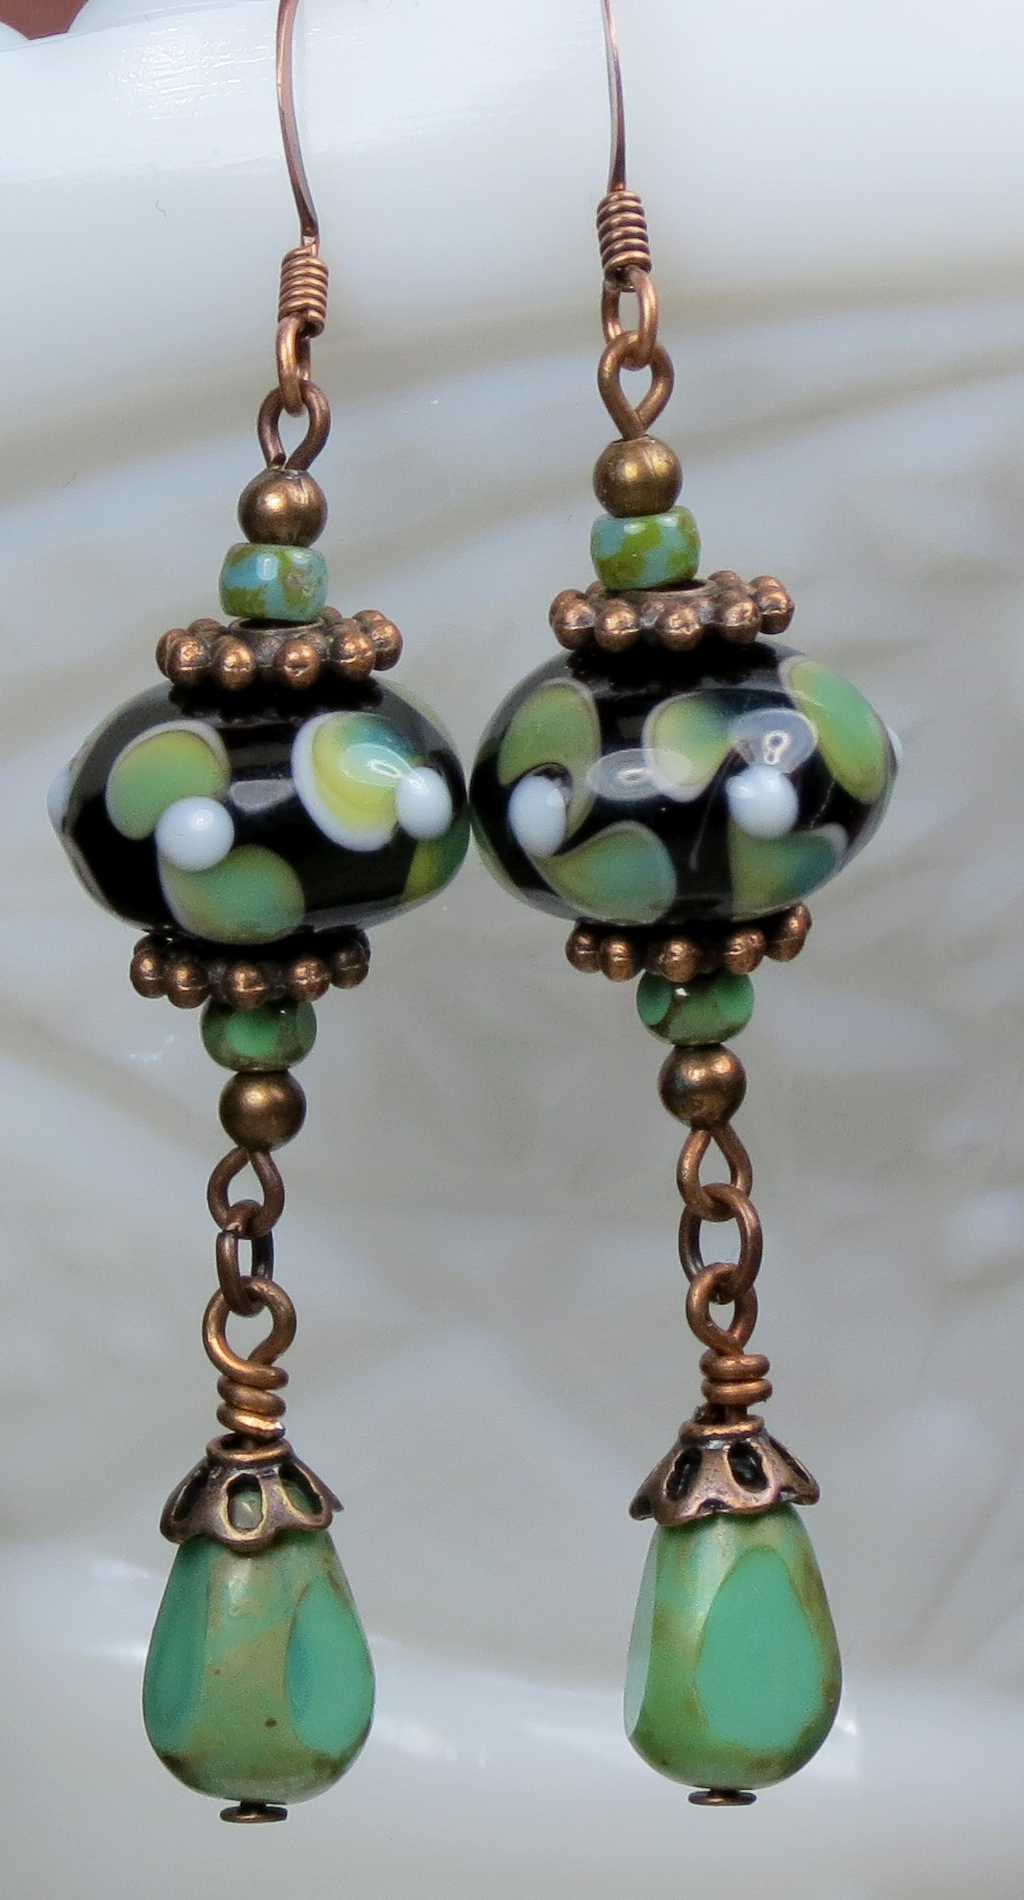 Boho Earrings  Black Earrings  Bead Earrings  Dangle Earrings  Drop Earrings  Gift for women  Gift for her